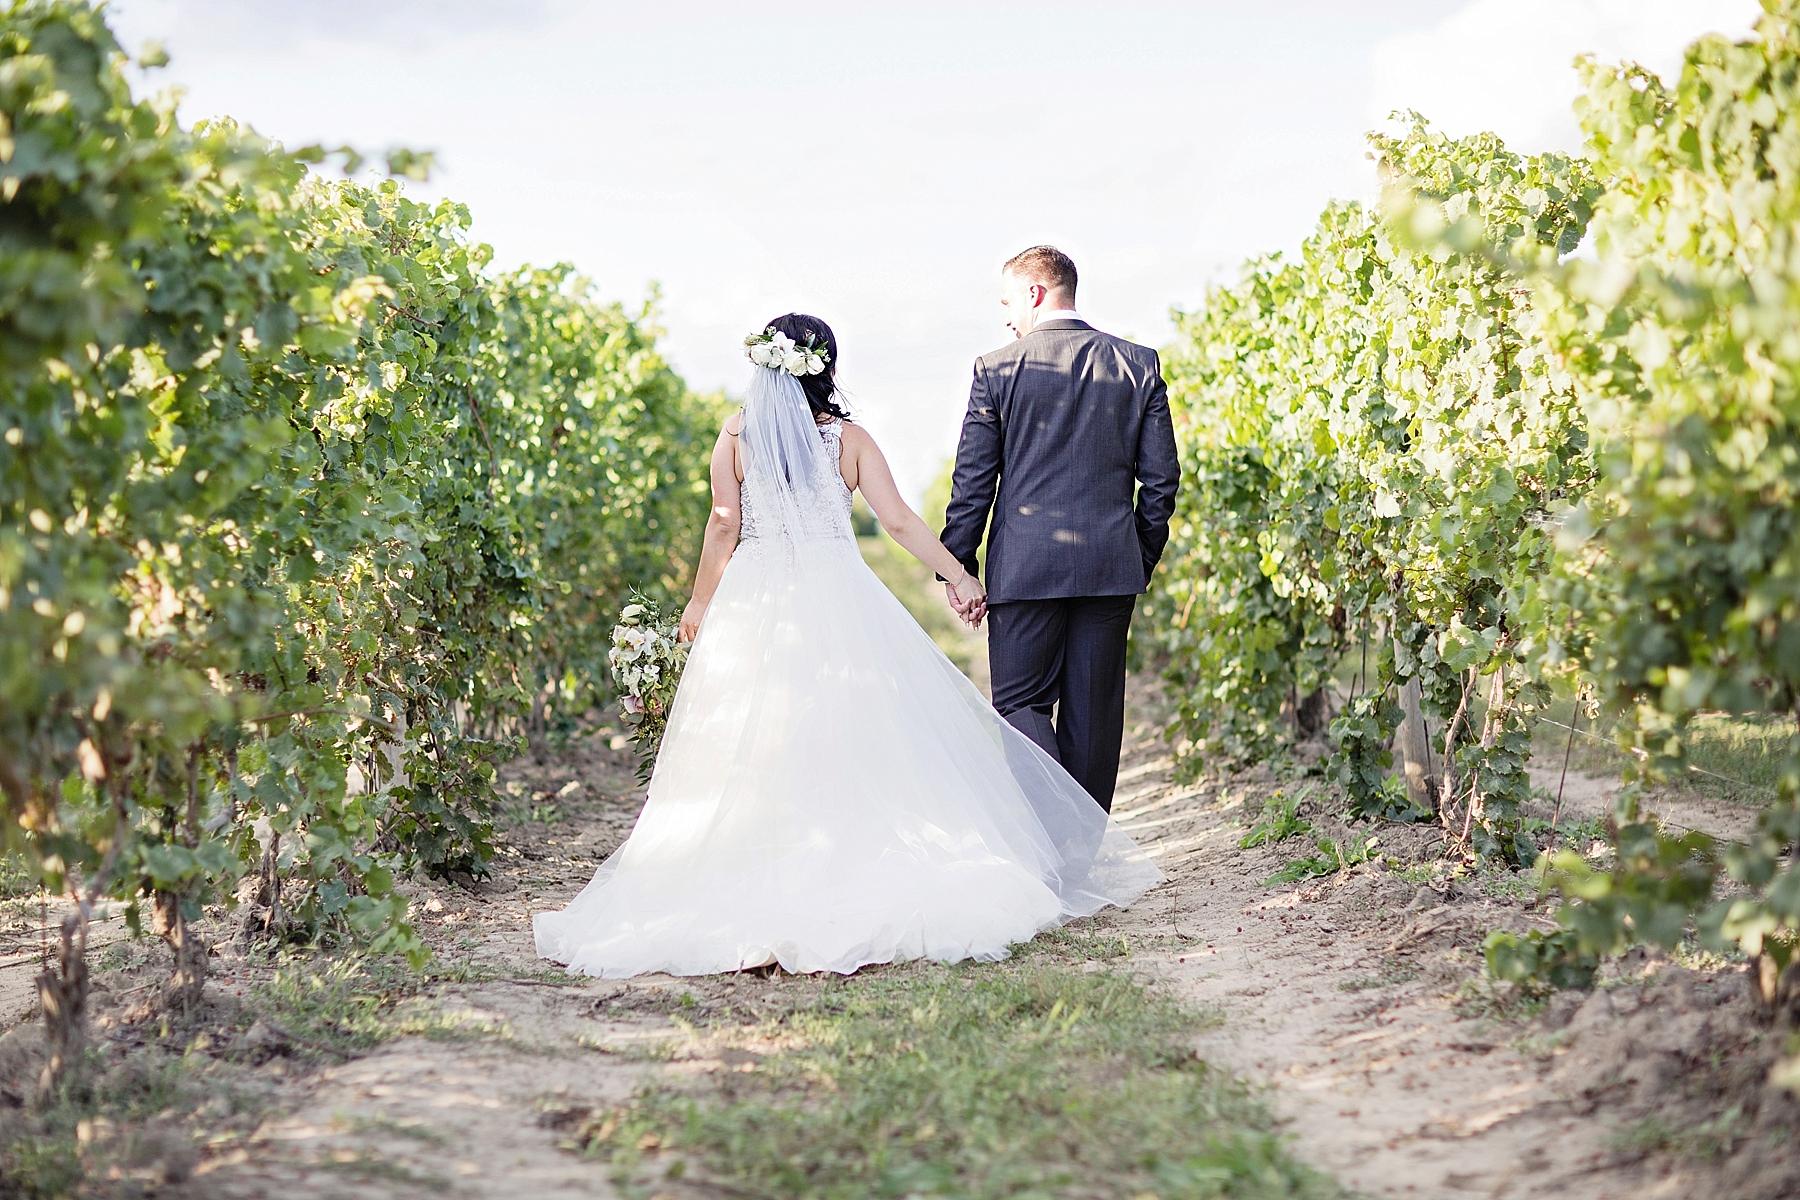 windsor-wedding-photographer-sprucewood-shores-winery-wedding-niagara-on-the-lake-wedding-photographer-eryn-shea-photography_0046.jpg